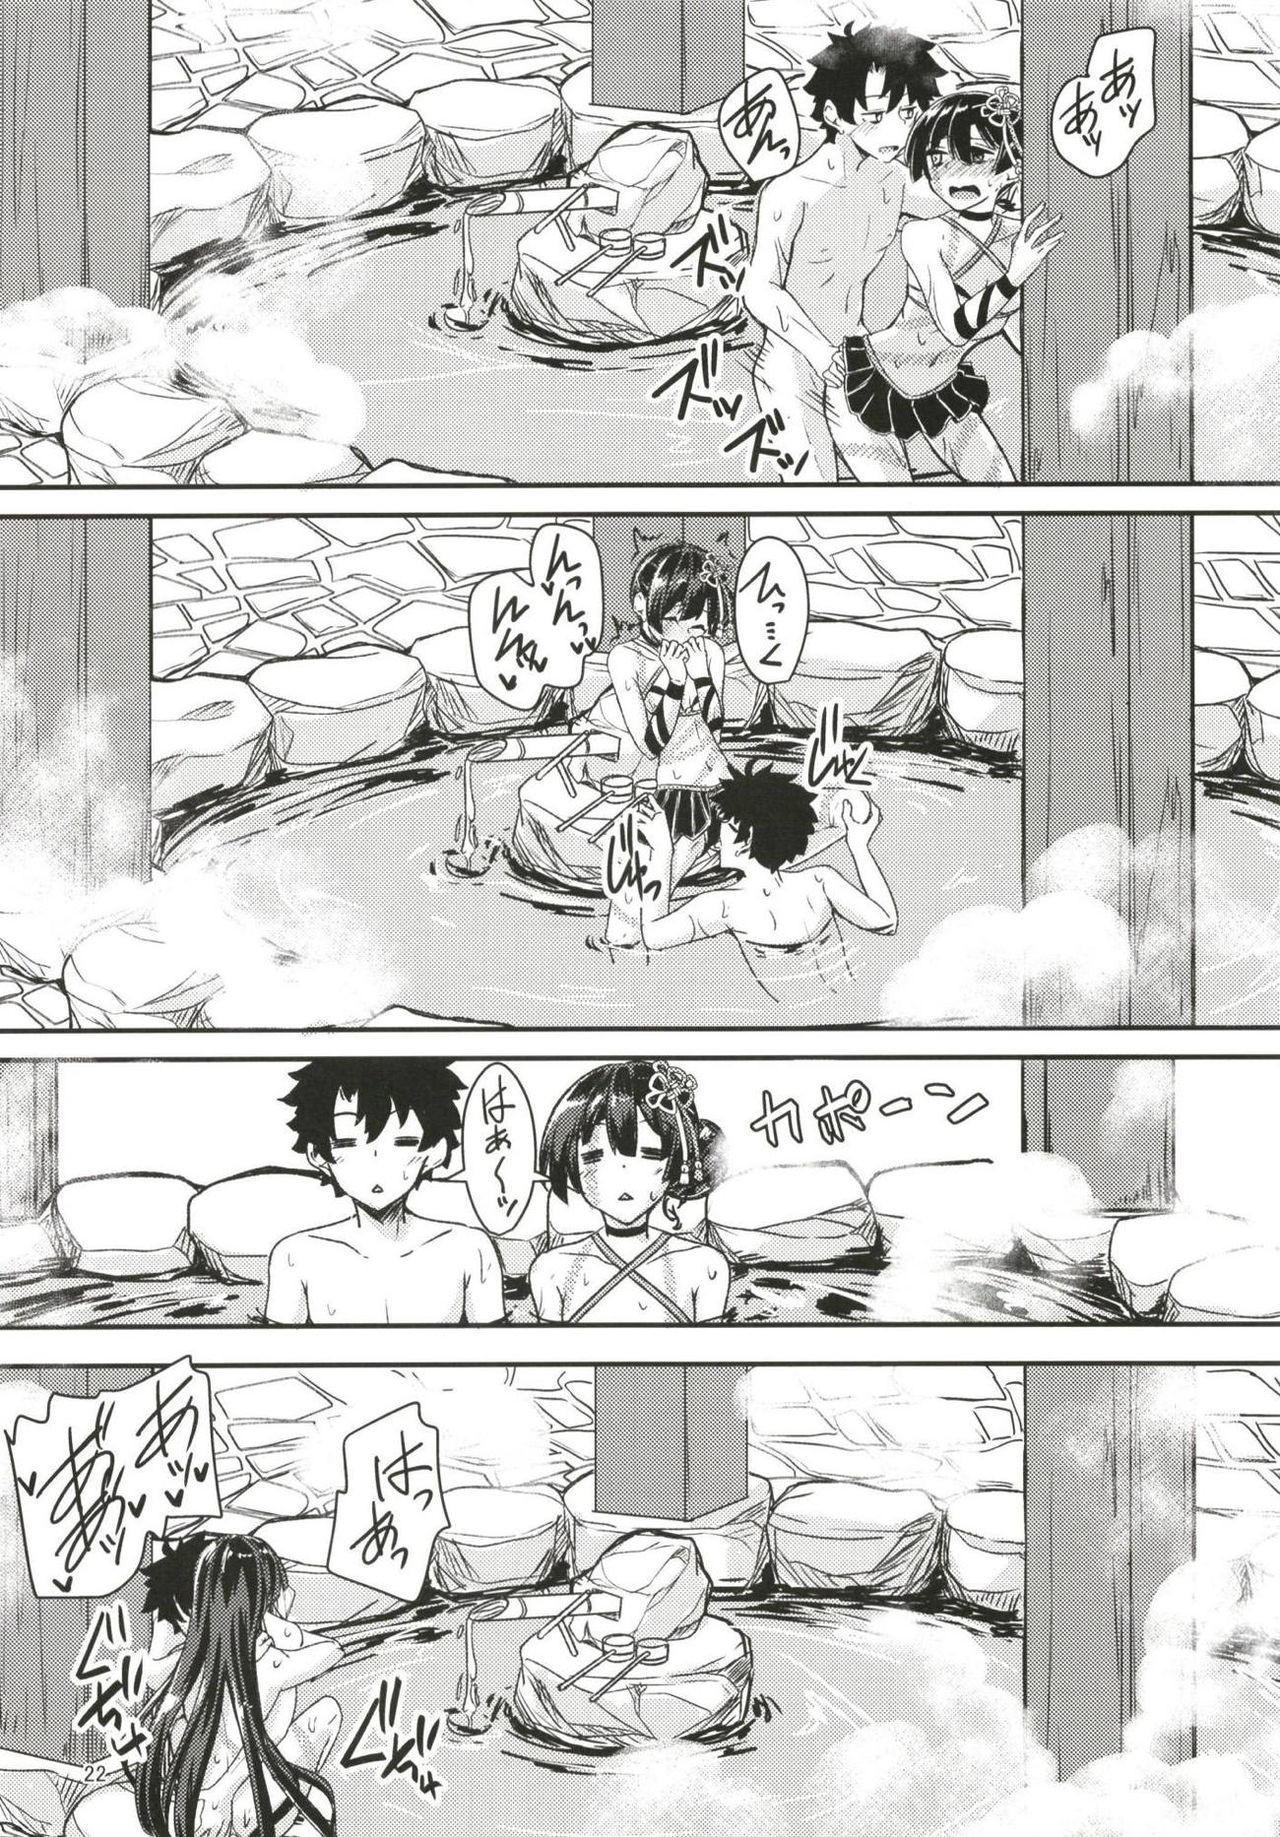 Paraiso Chii-chan to Yukemuri de Hawawa! 20